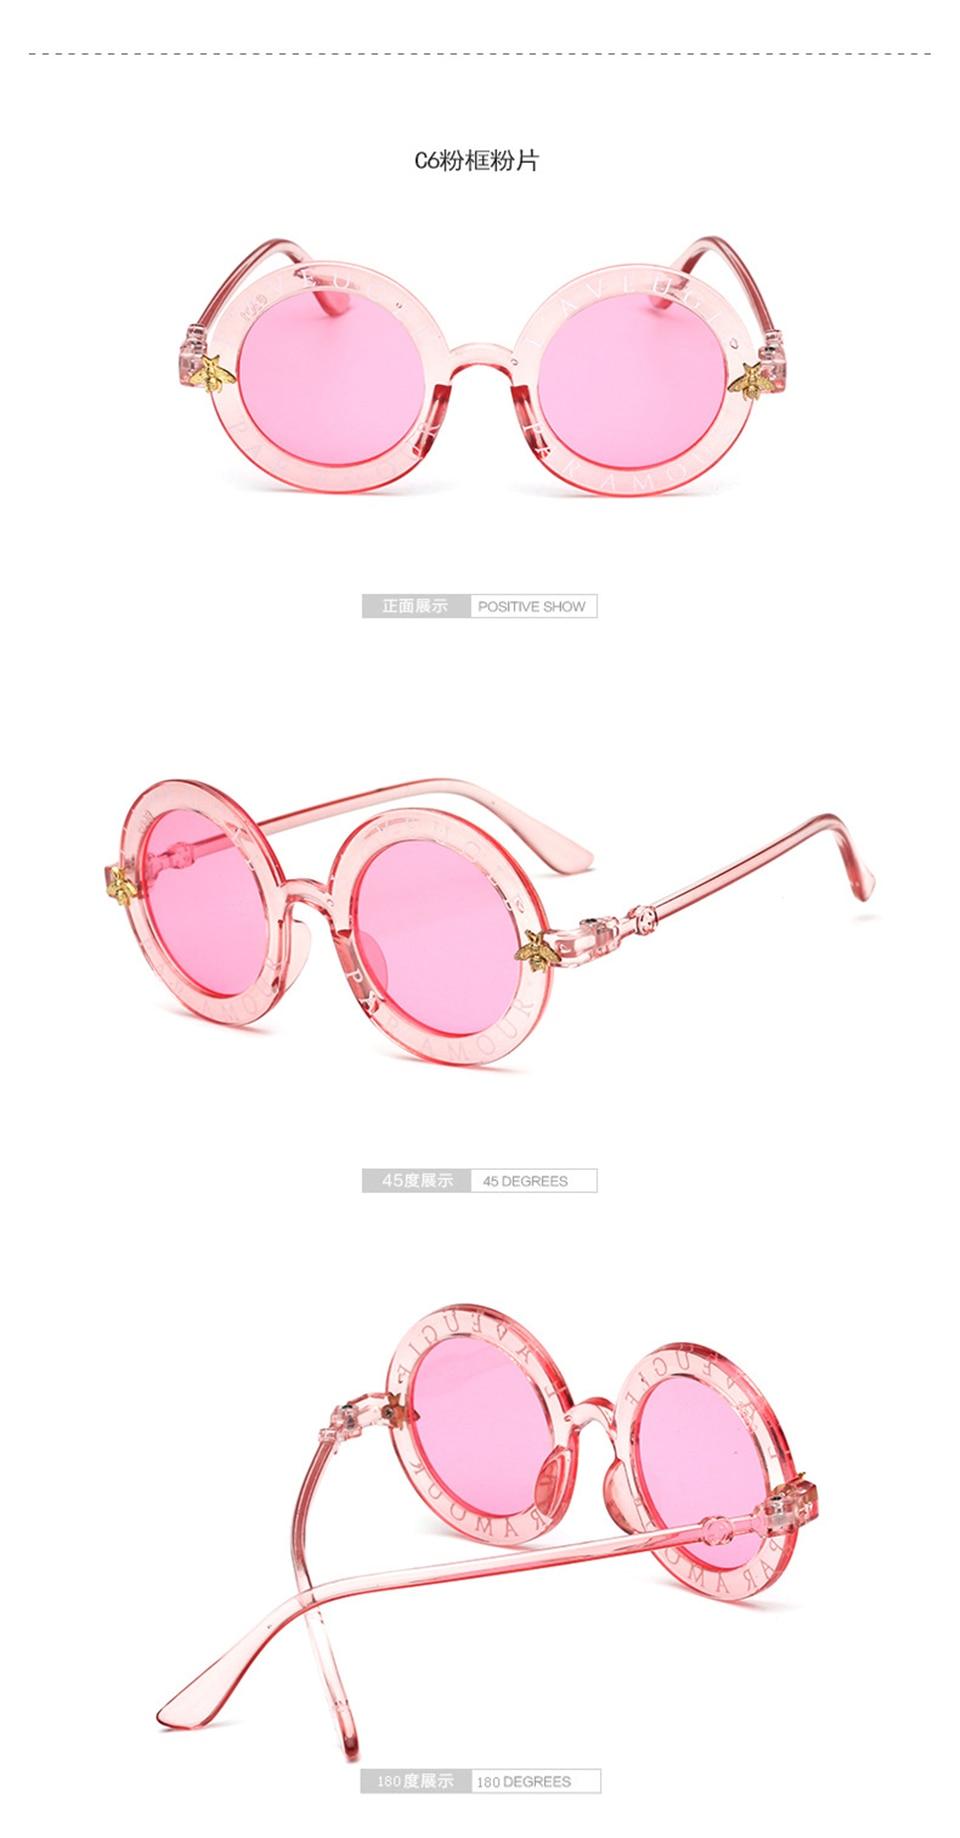 Steampunk Bee Kids Sunglasses Boys Girls Luxury Vintage Children Sunglasses Round Sun Glasses Oculos Feminino Accessories 9